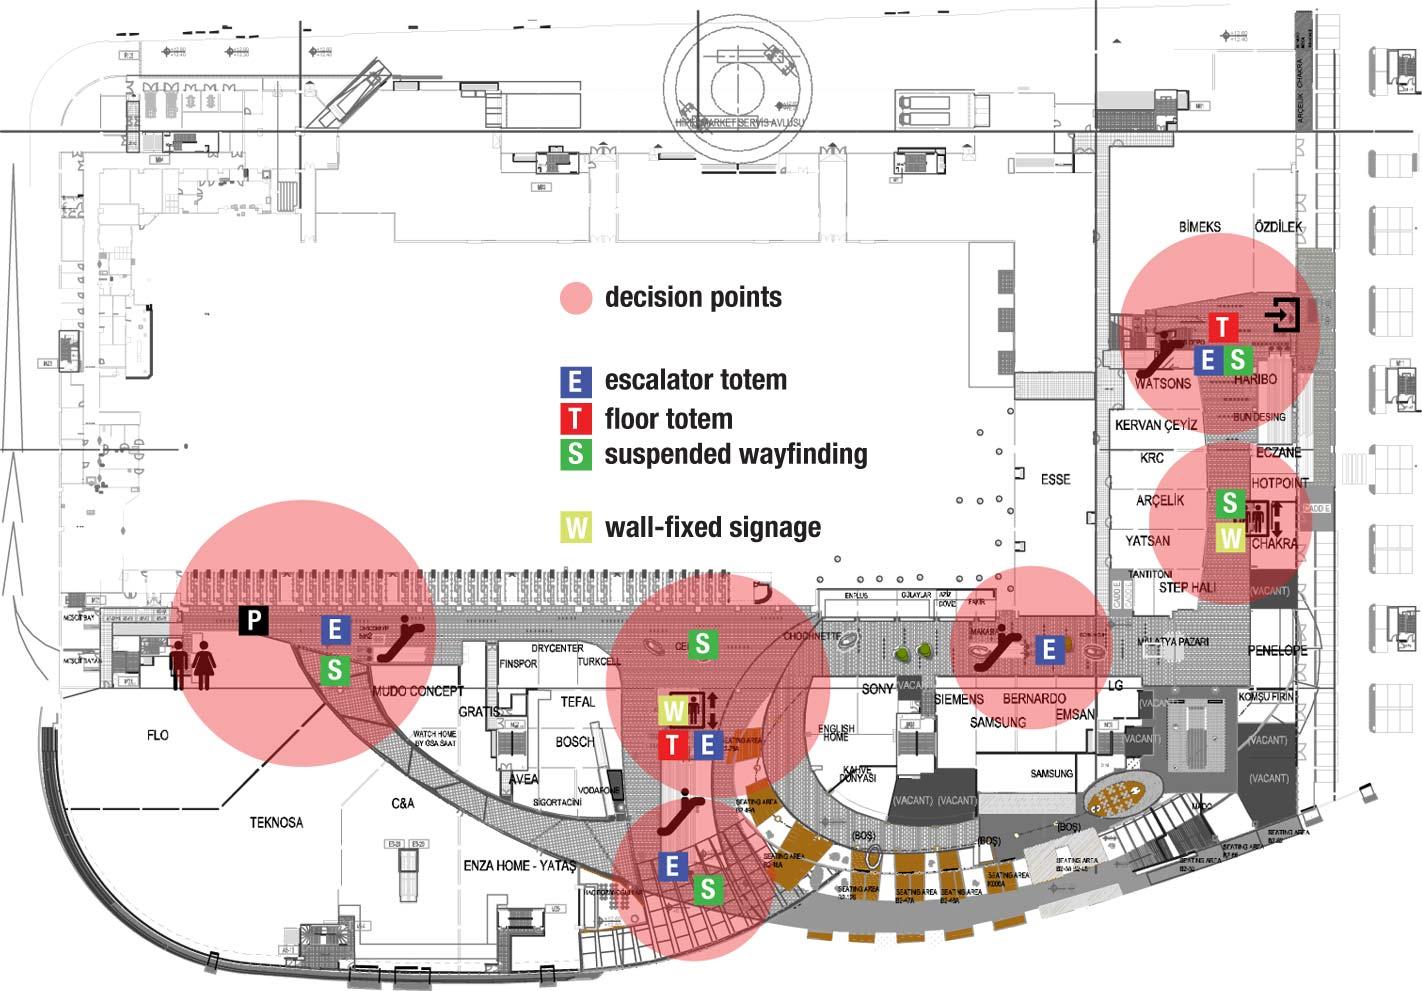 Marmara Forum planning the navigation system Istanbul, Turkey designed by CampbellRigg